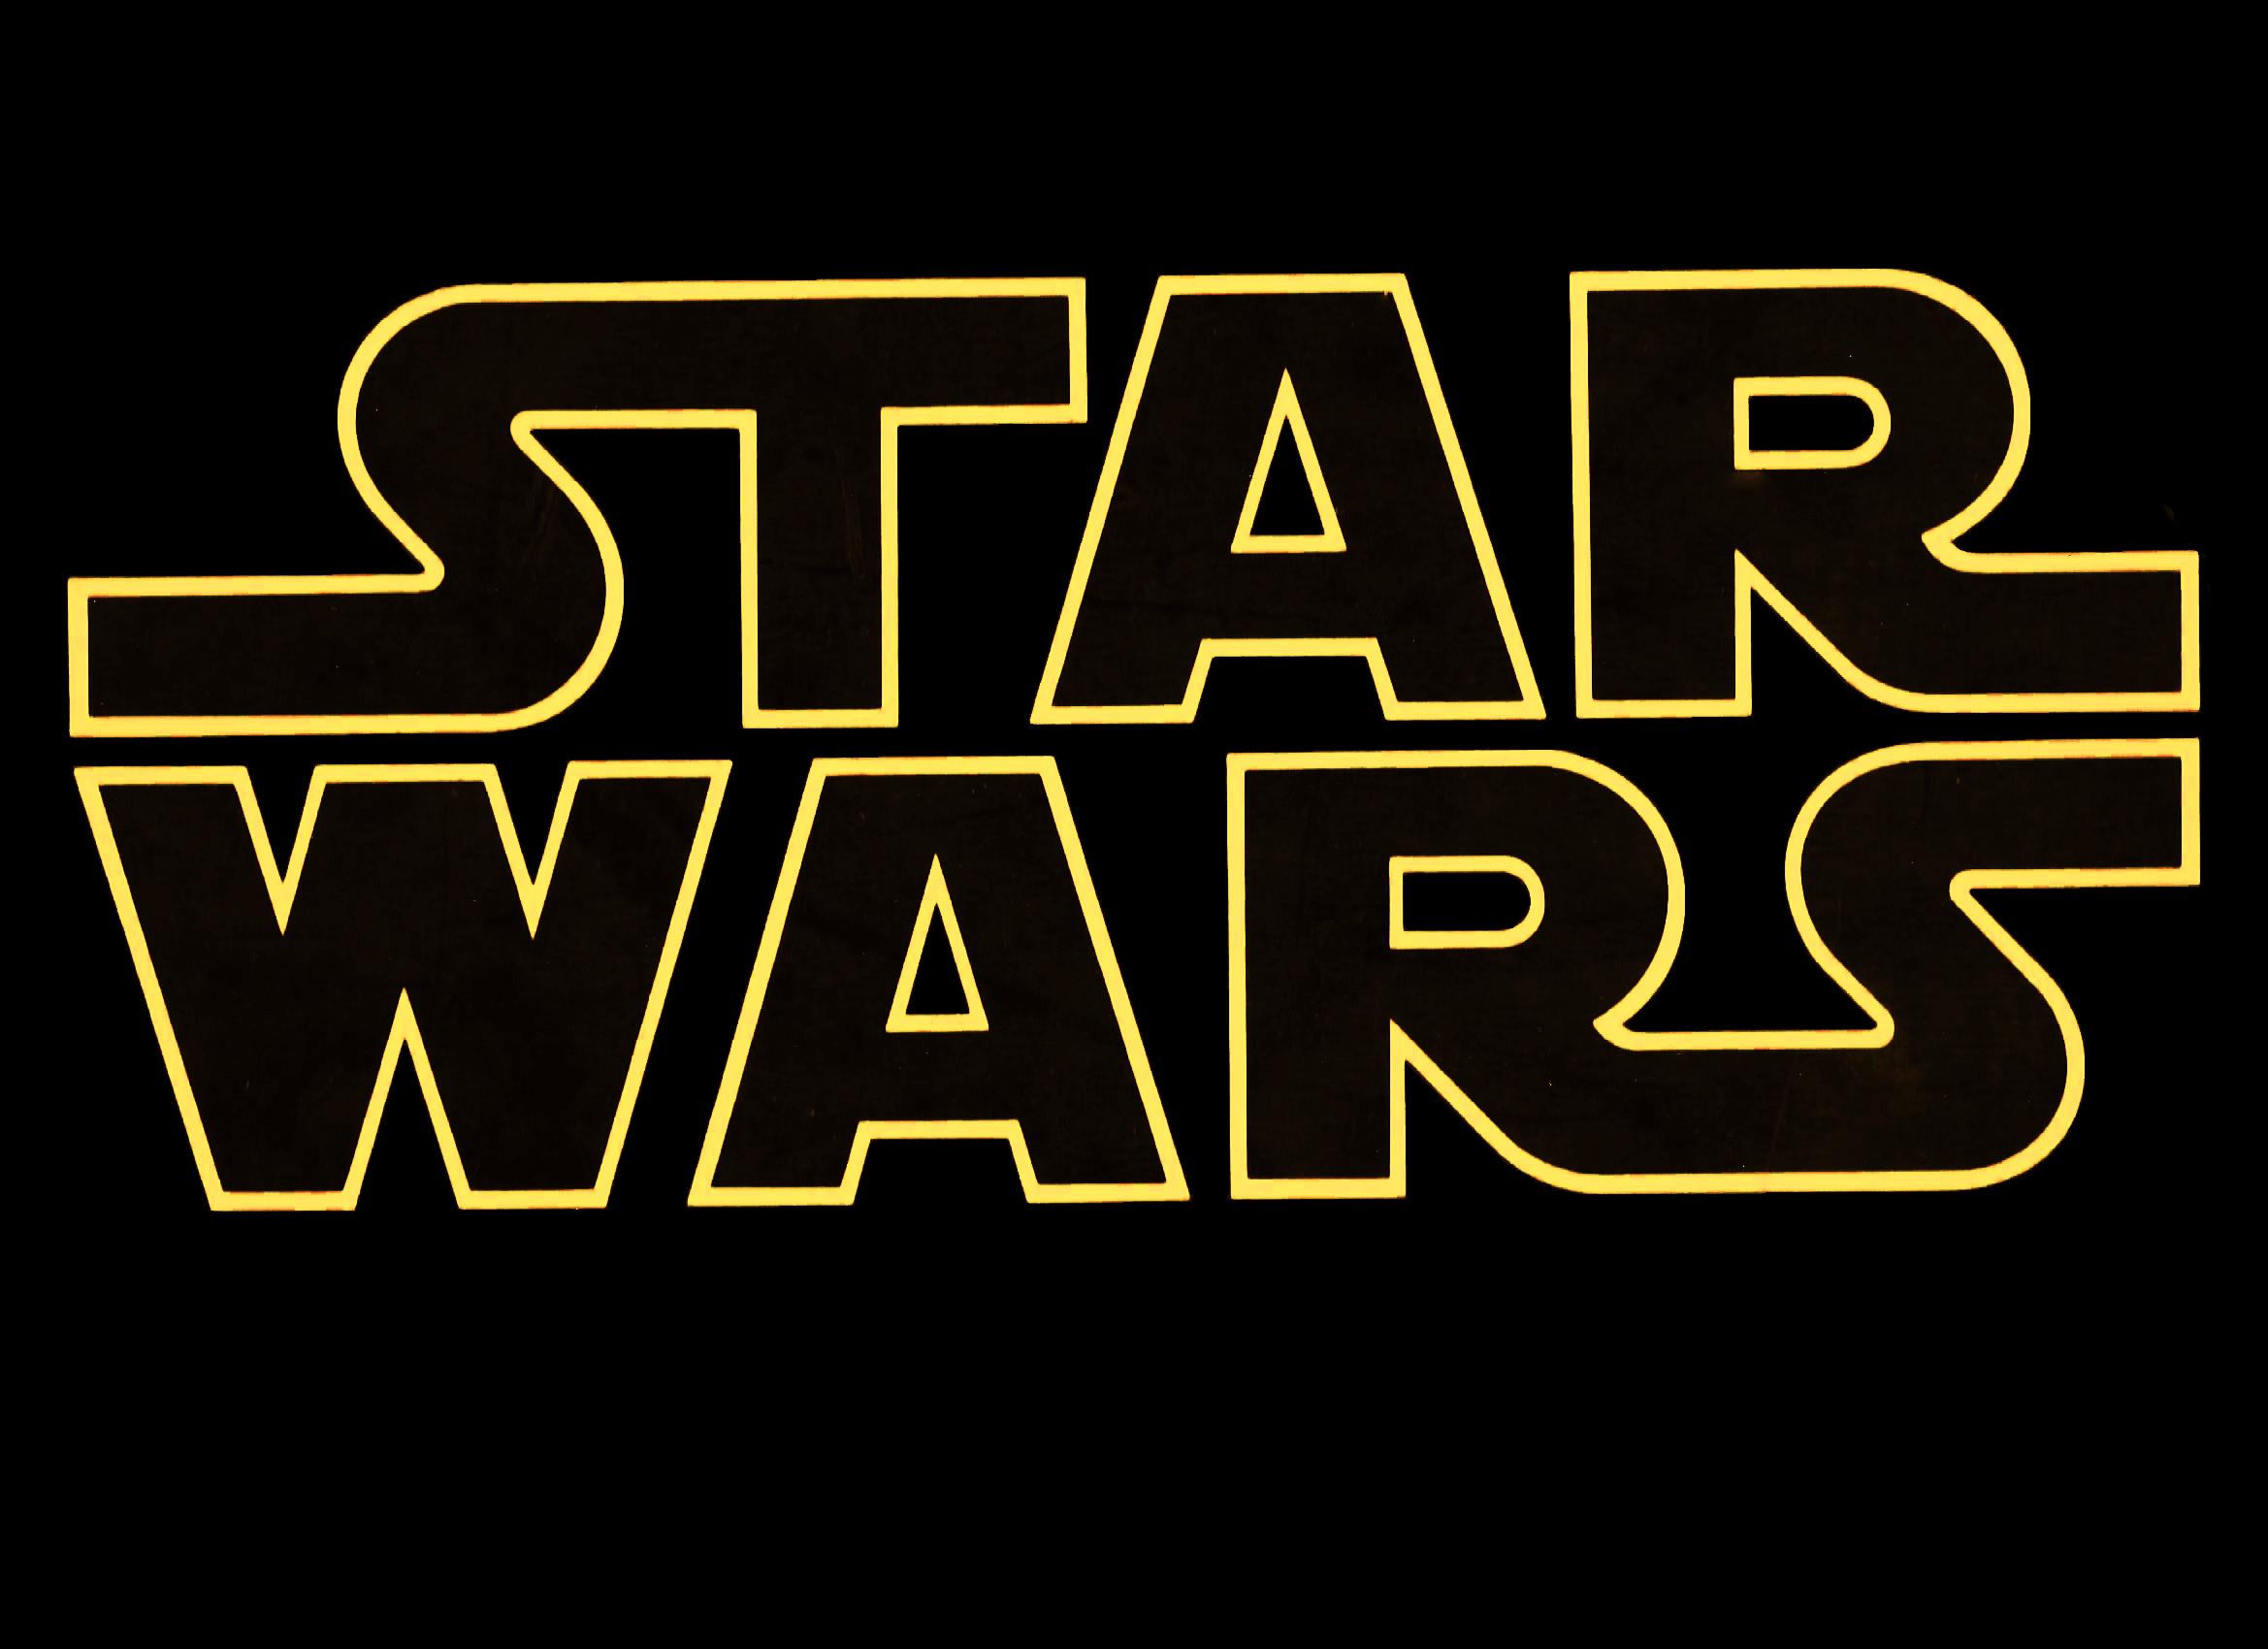 Star wars logo clipart image free stock Star Wars Logo PNG image free stock